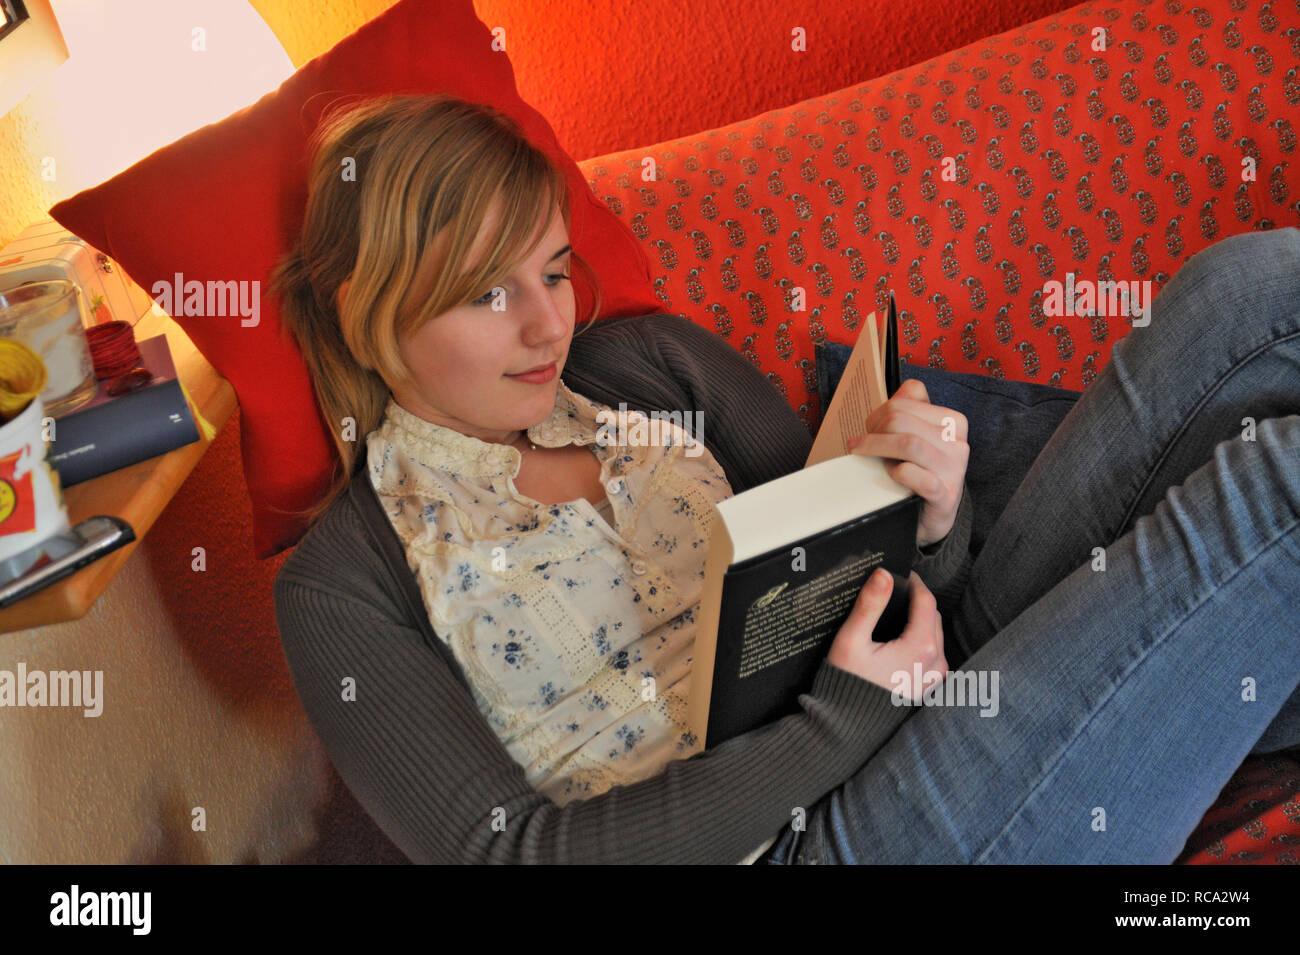 jugendliches Mädchen in ihrem Zimmer liest ein Buch | young female teenager in her room reading a book Stock Photo